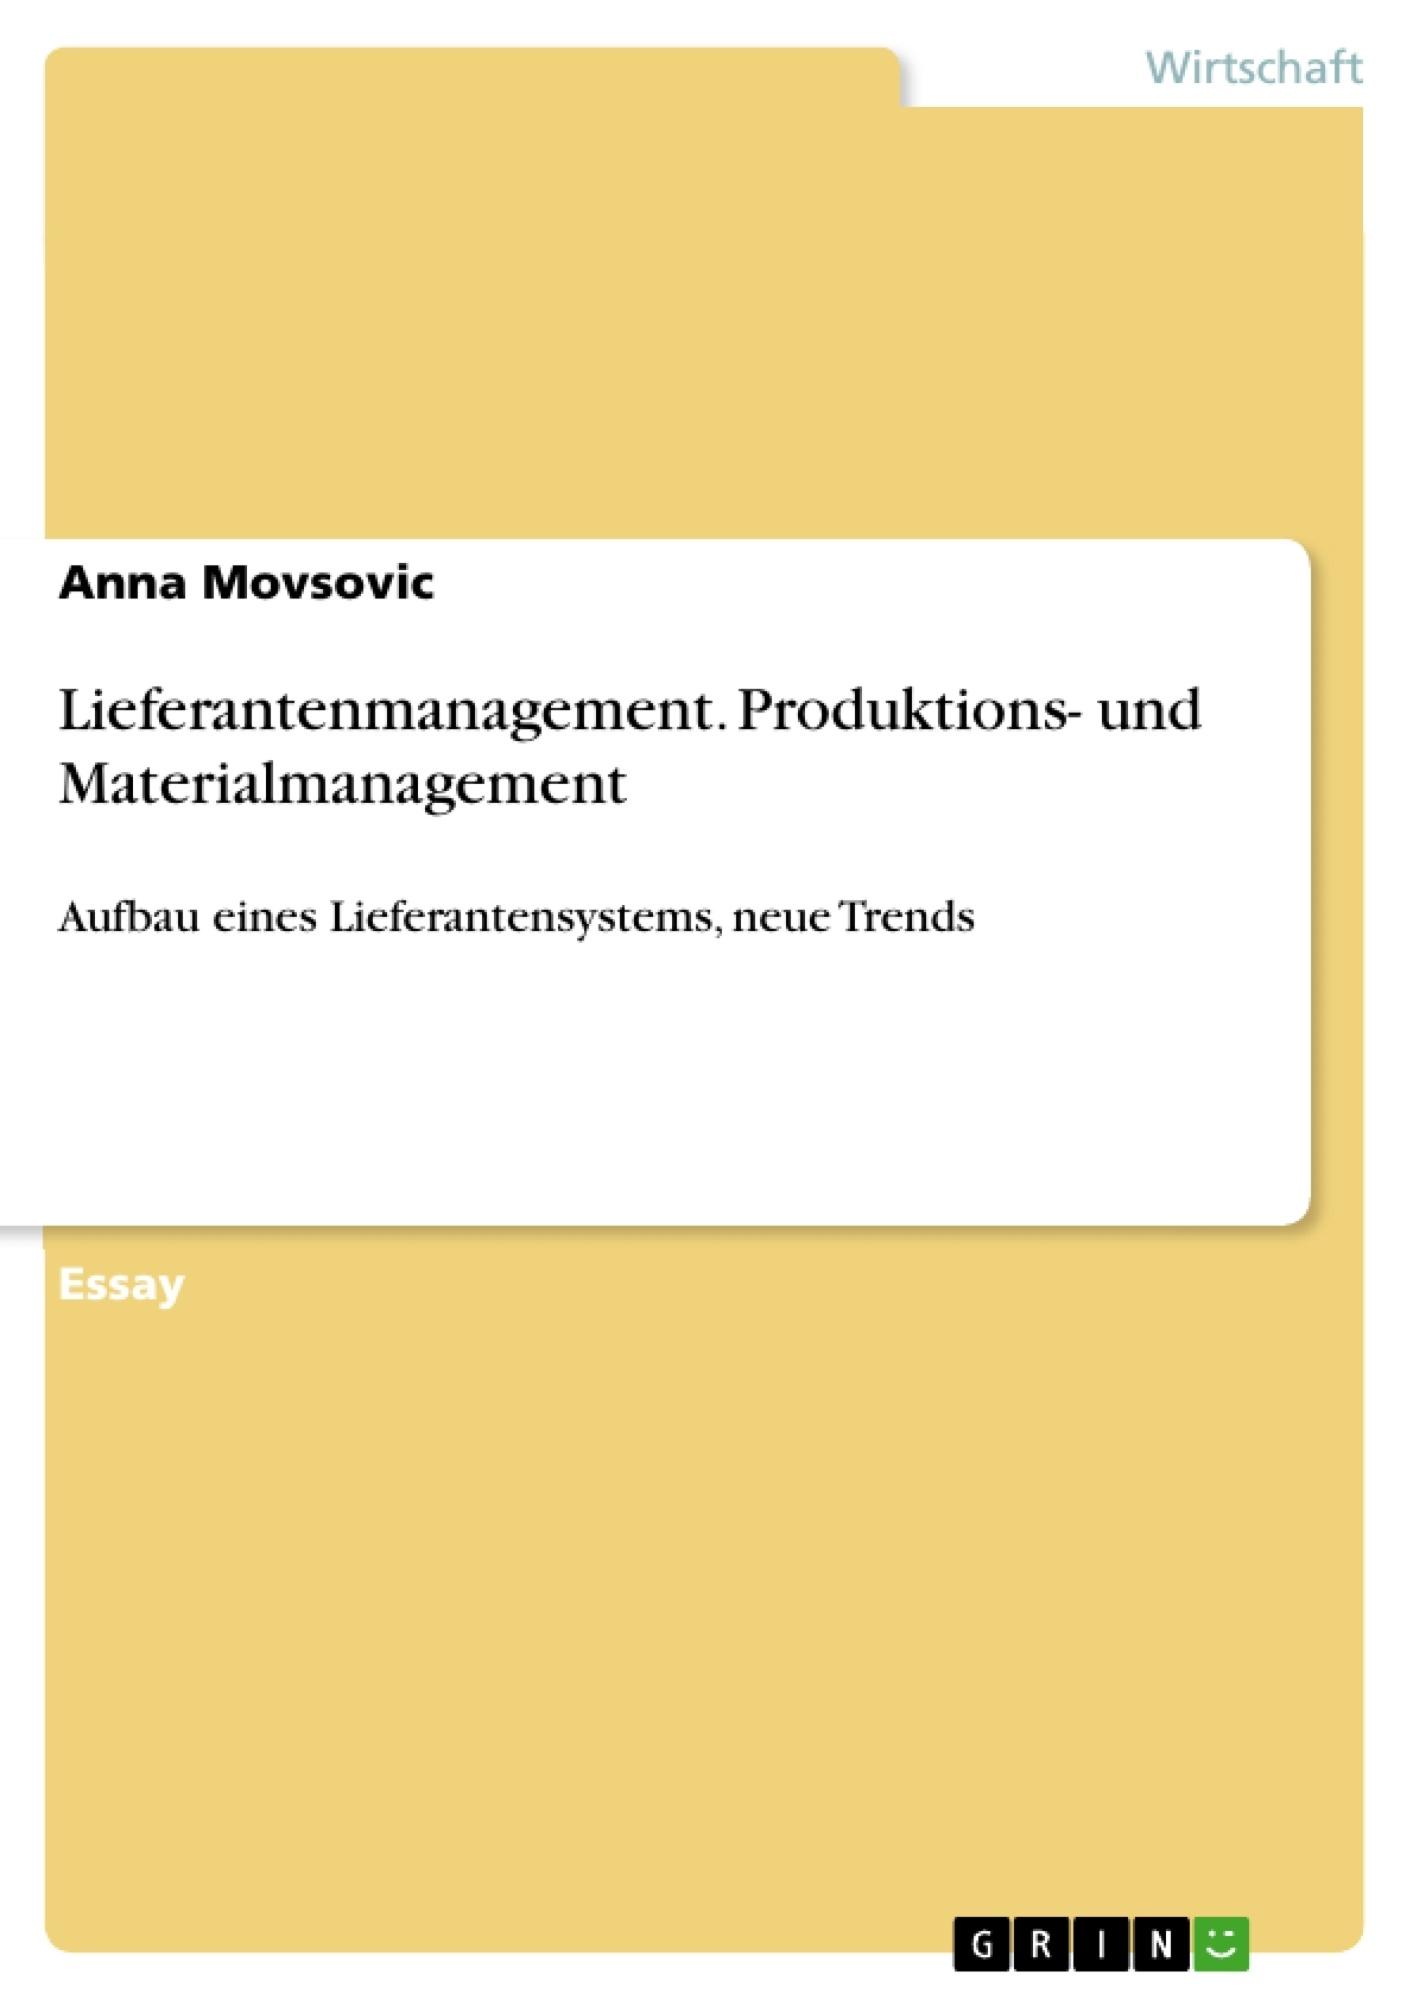 Titel: Lieferantenmanagement. Produktions- und Materialmanagement